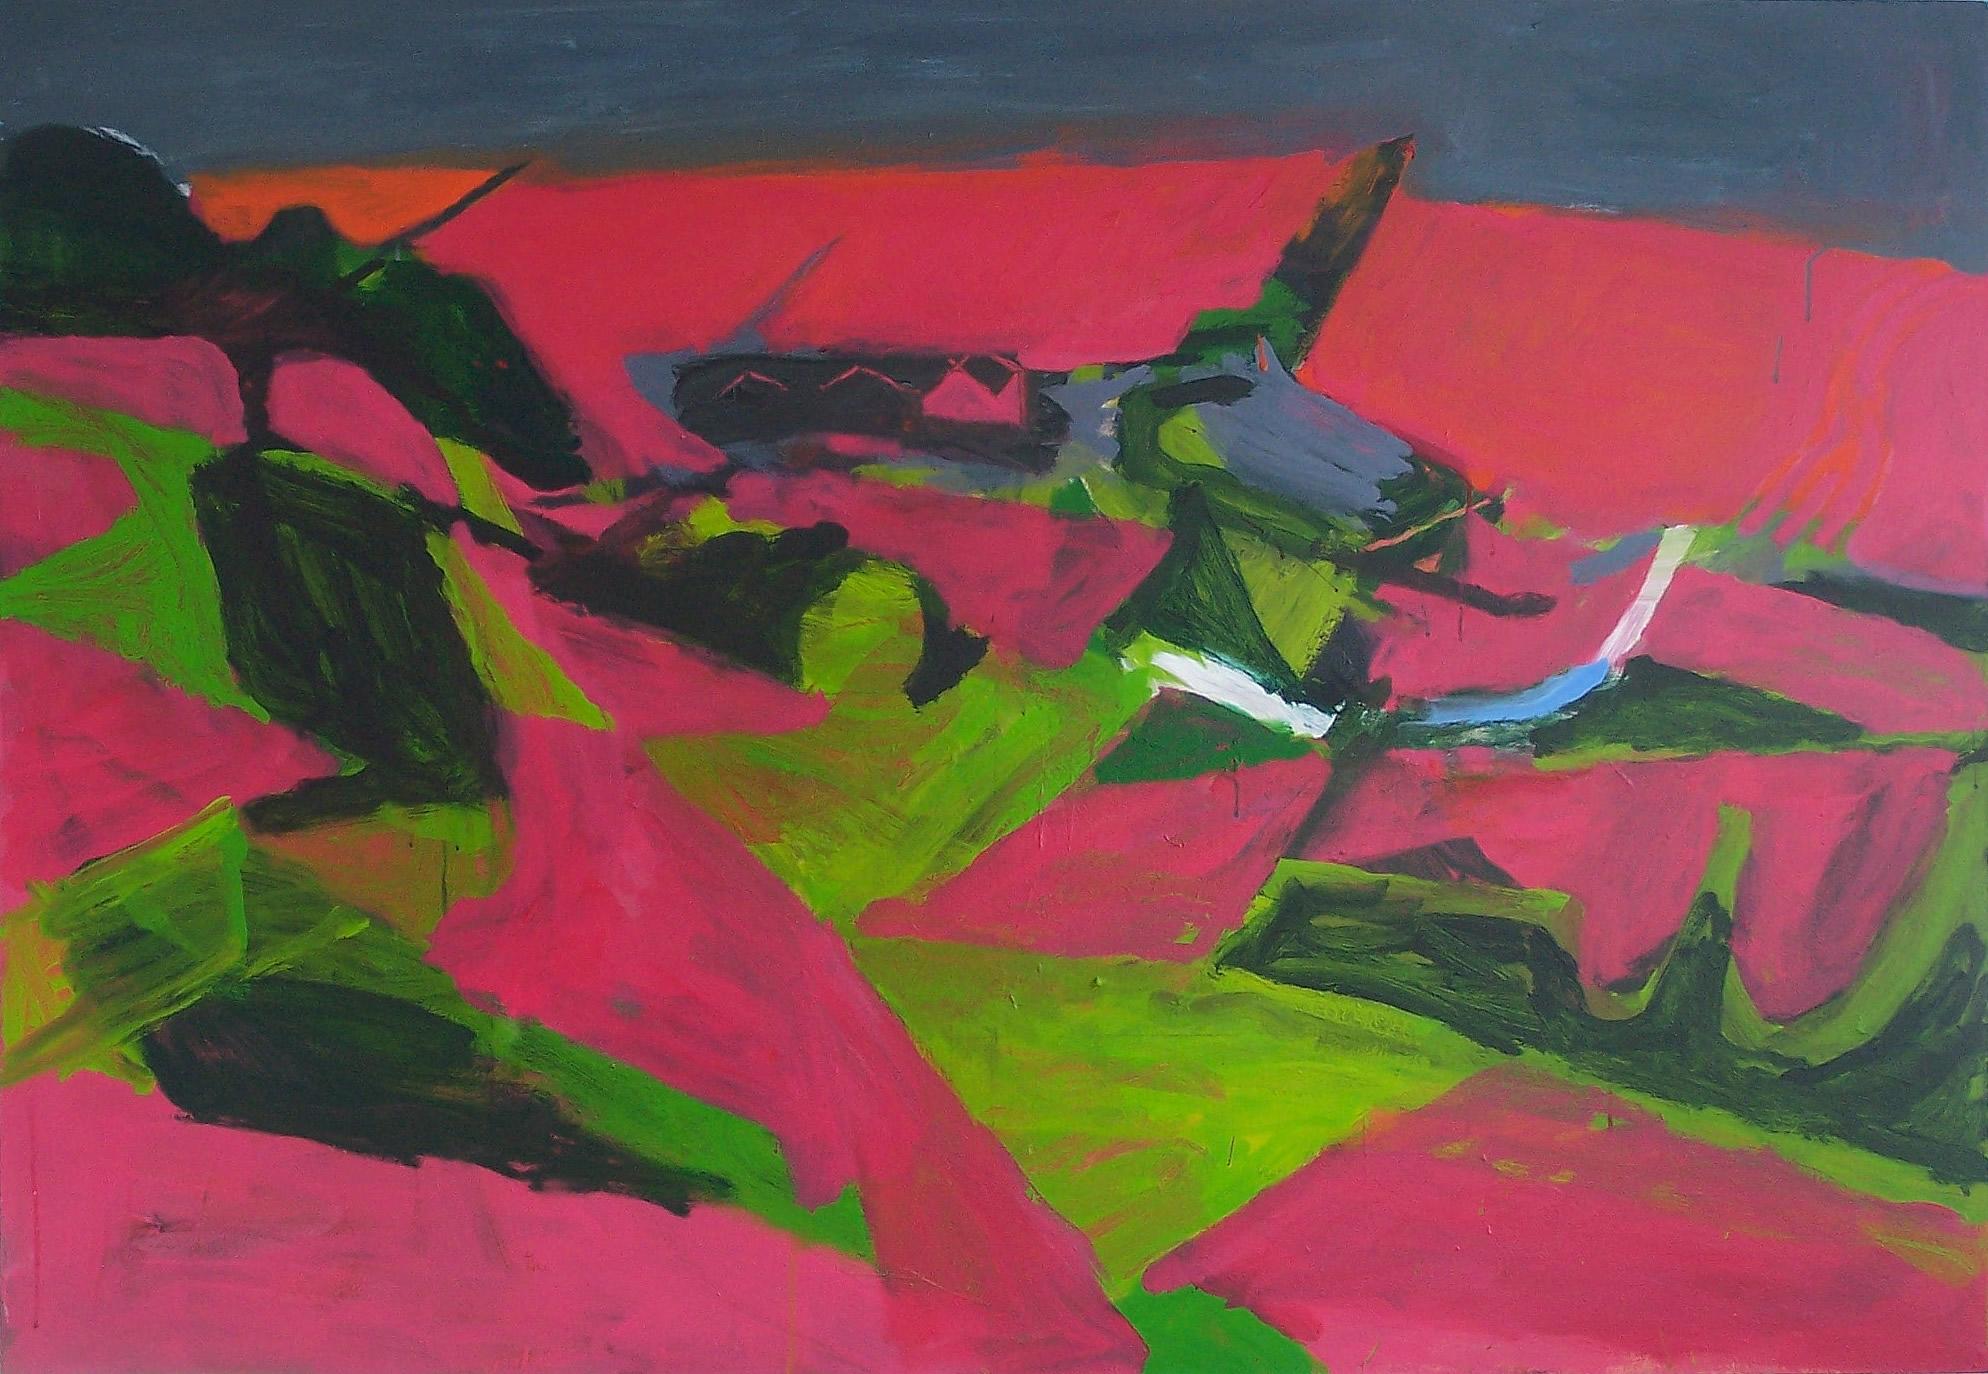 Seacliff, 2009